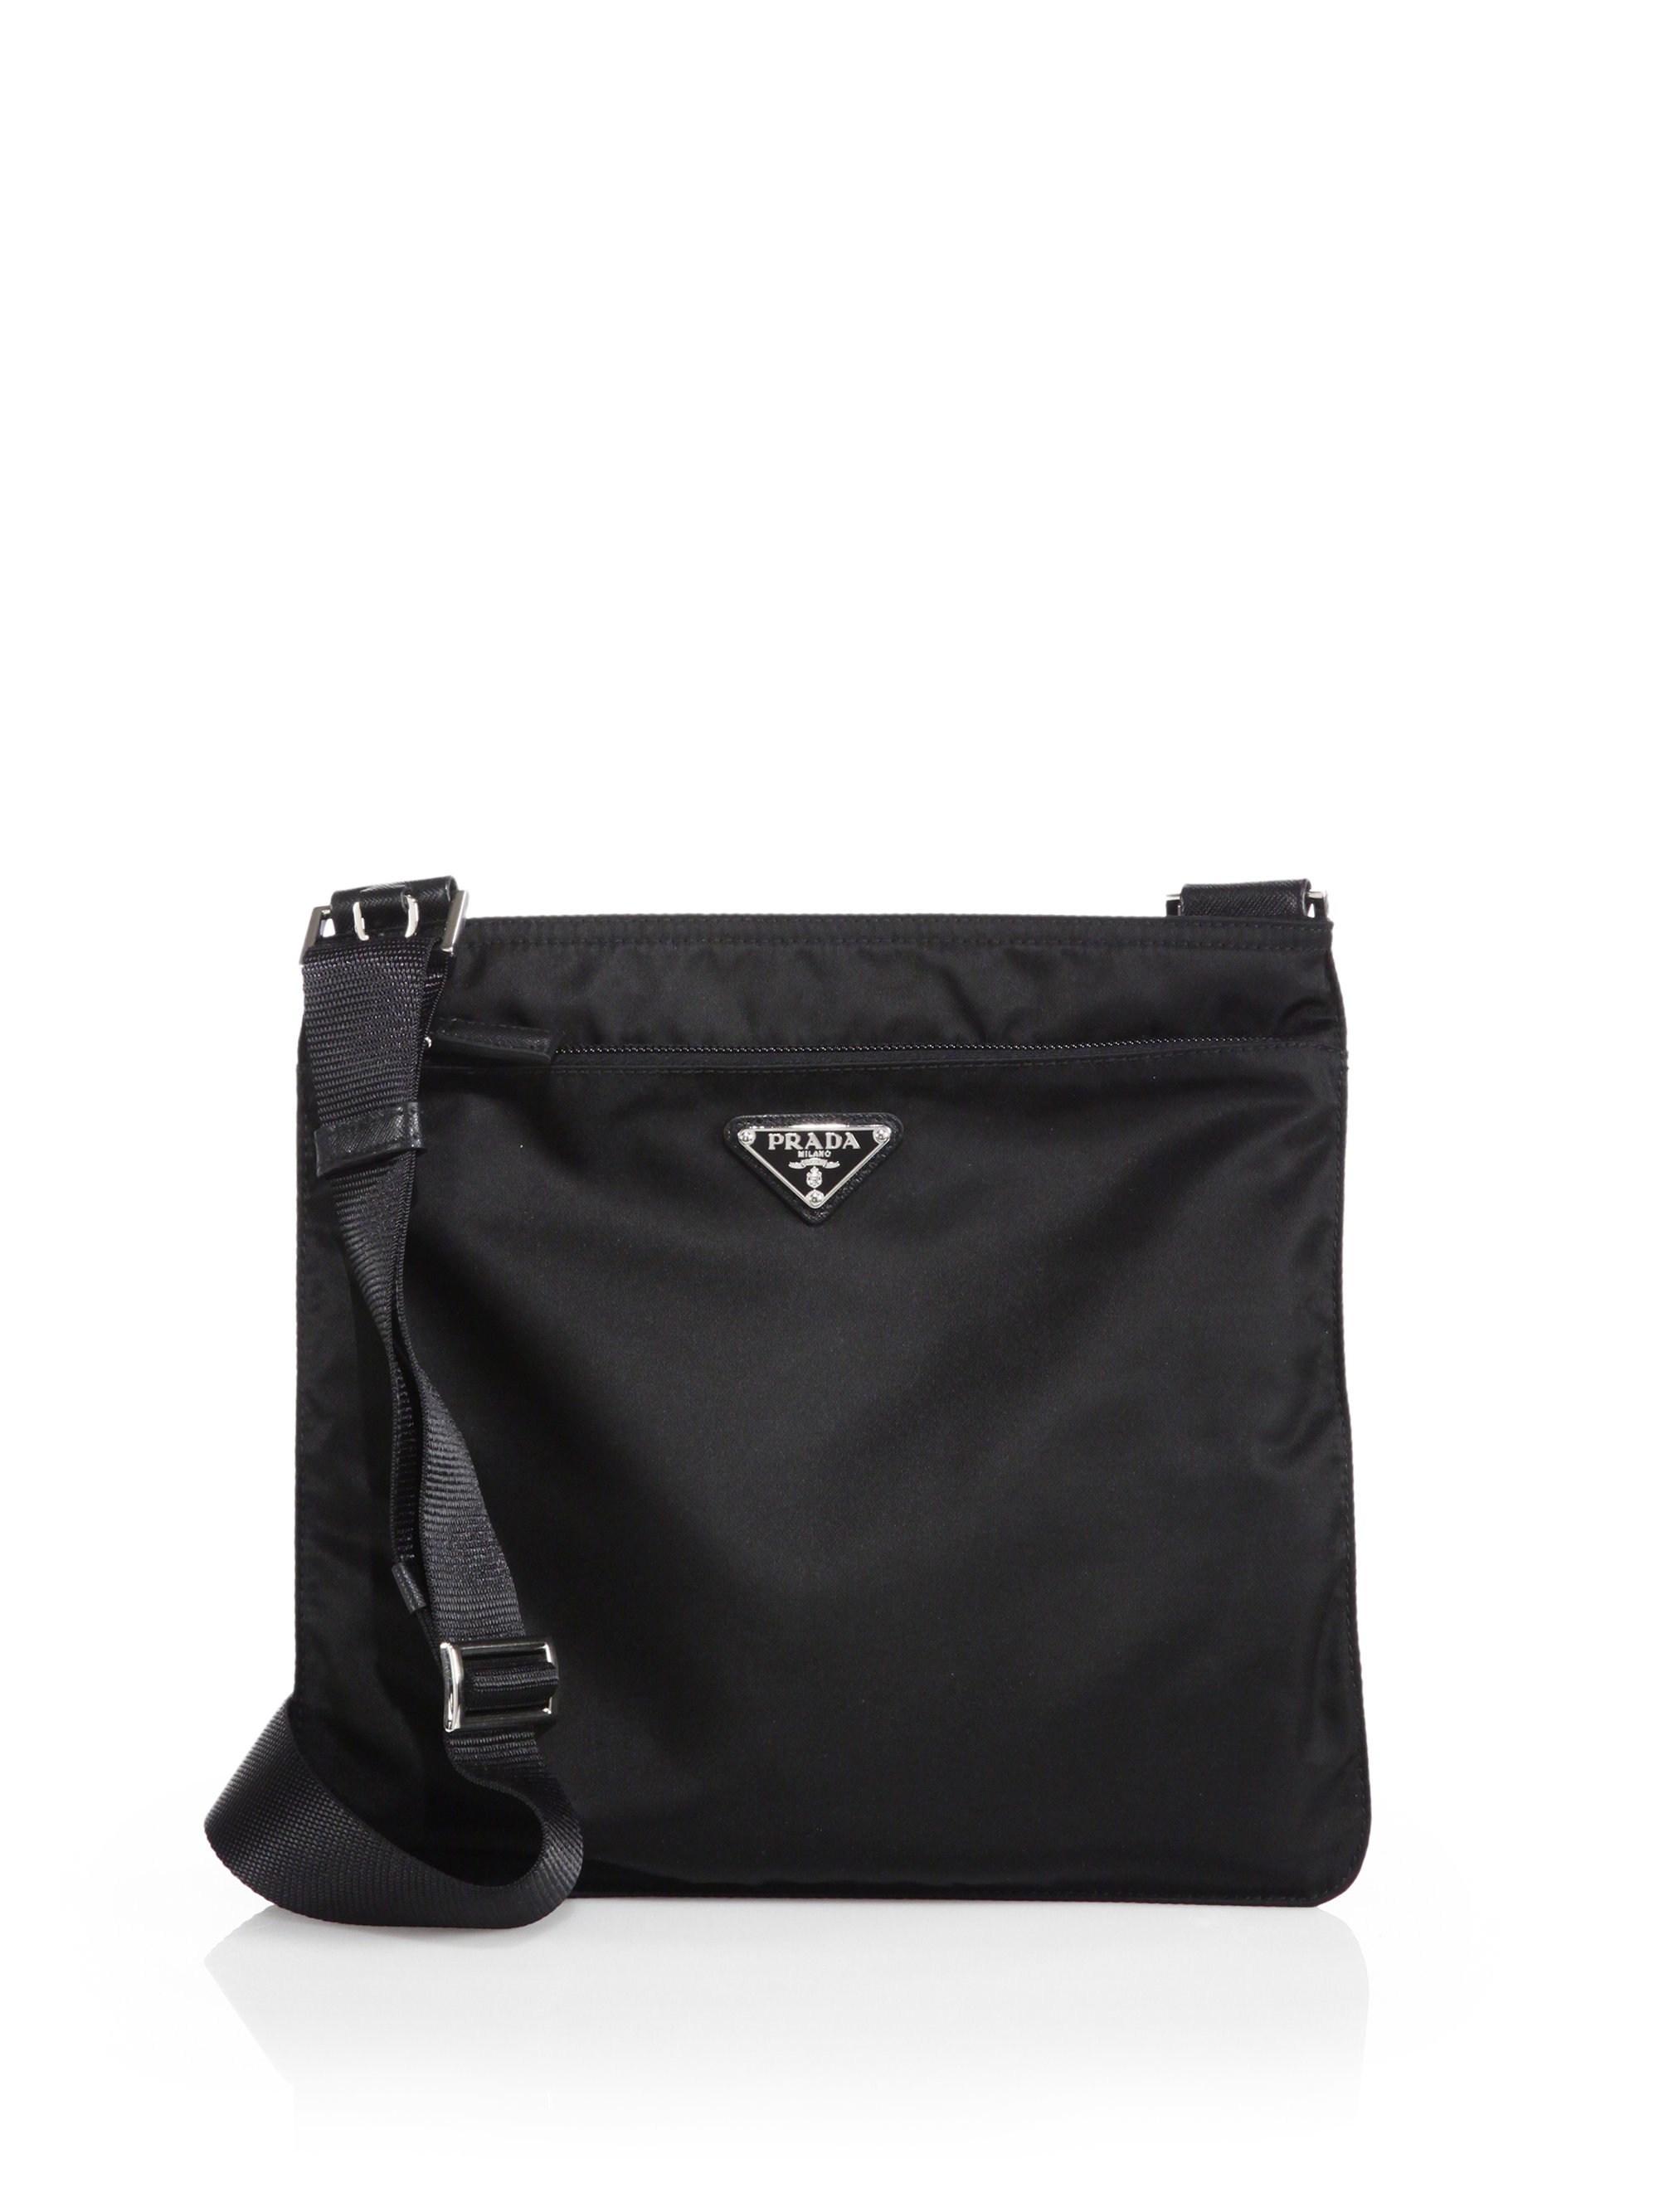 Prada - Black Vela Nylon Bag - Lyst. View fullscreen d0b01c76ed